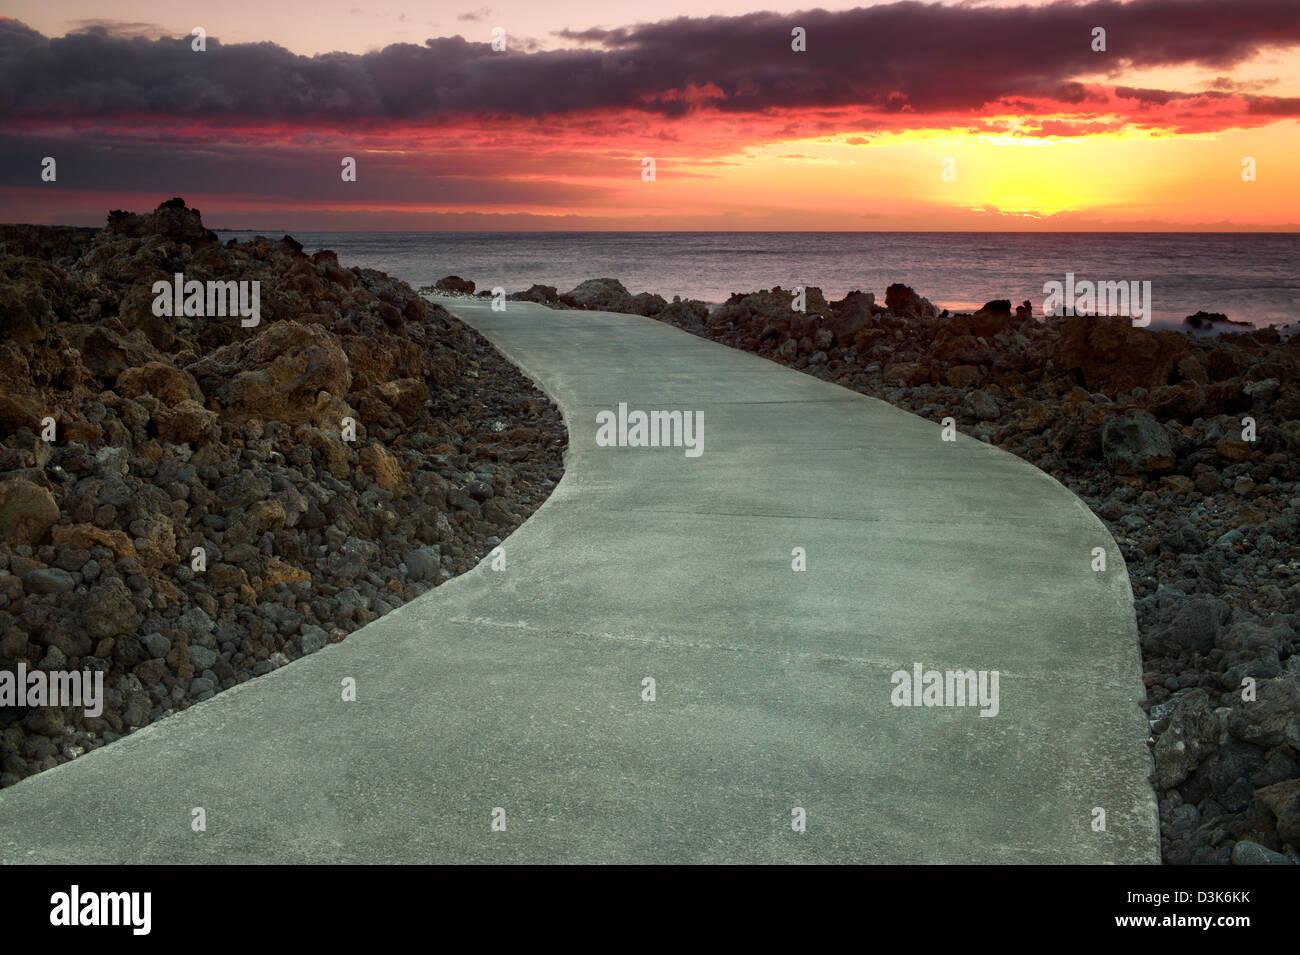 Pfad und Ozean. Der Kohala Küste, Hawaii, Big Island. Stockbild